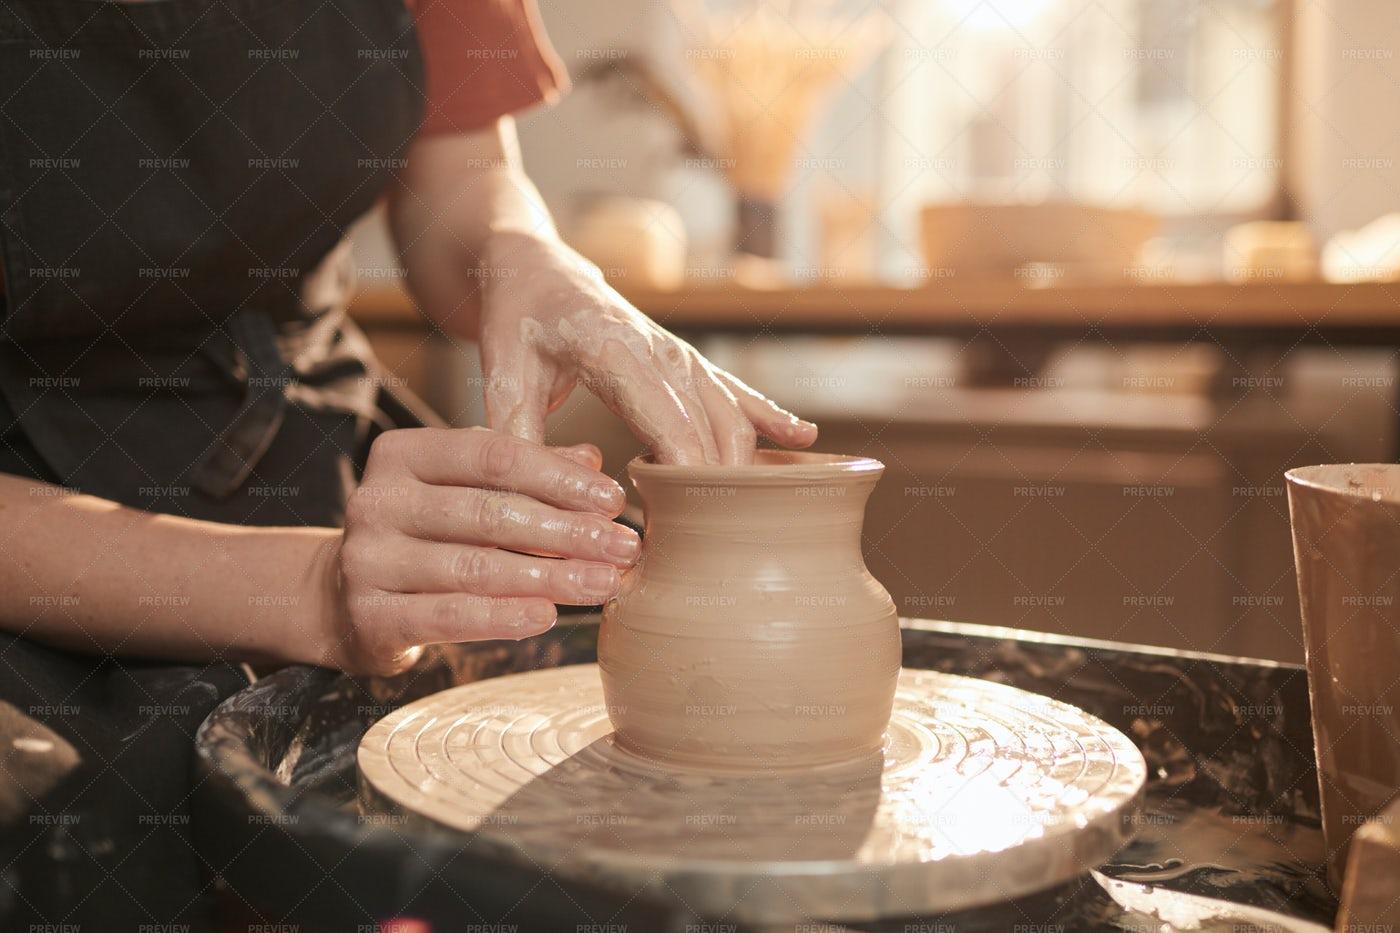 Handmade Pottery In Sunlight: Stock Photos